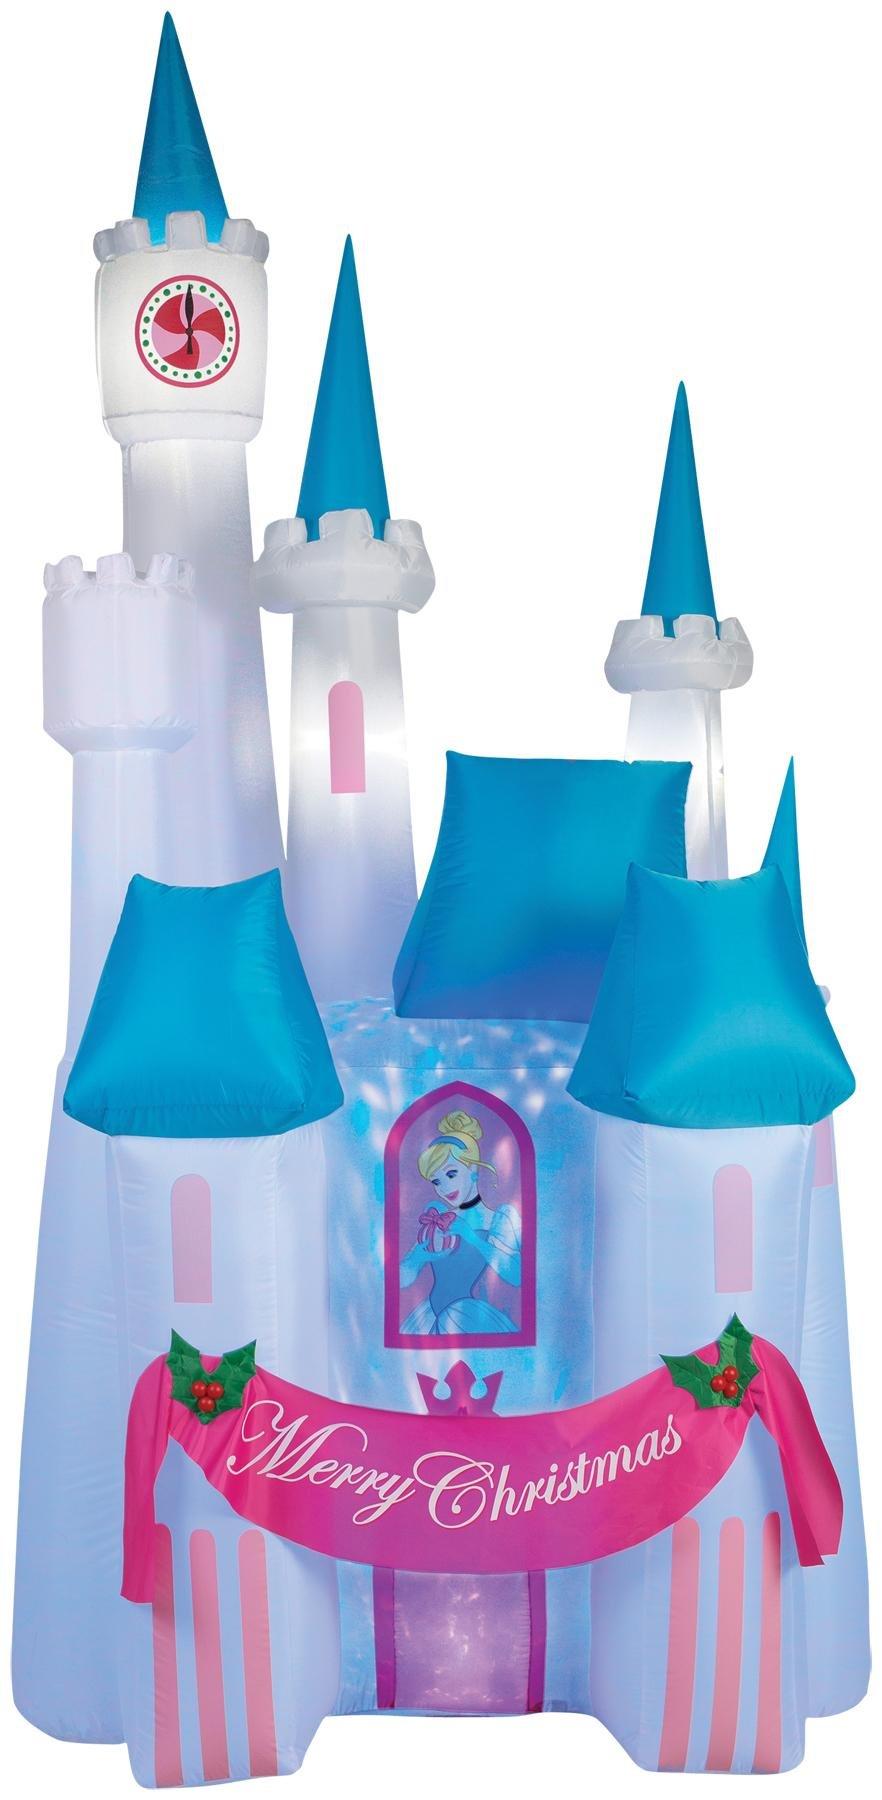 Projection Airblown Cinderella Castle Decoration